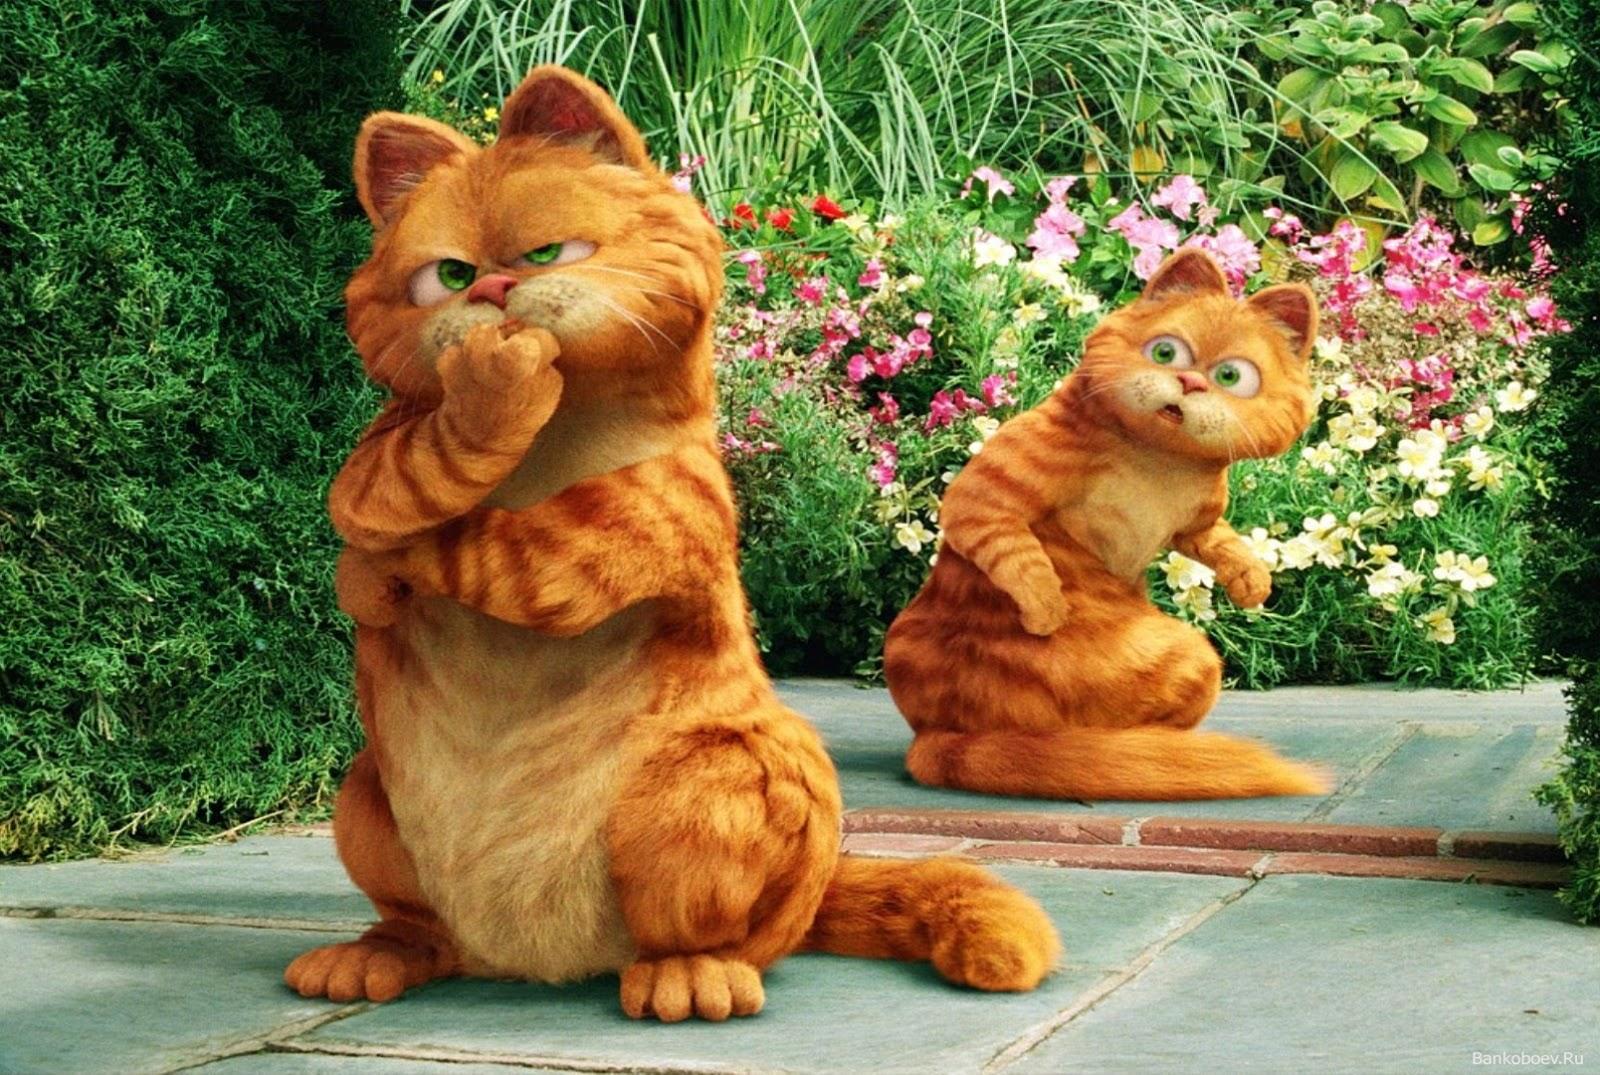 Gambar Kata Kata Lucu Orang Wallpaper Lucu Gambar Kucing Garfield